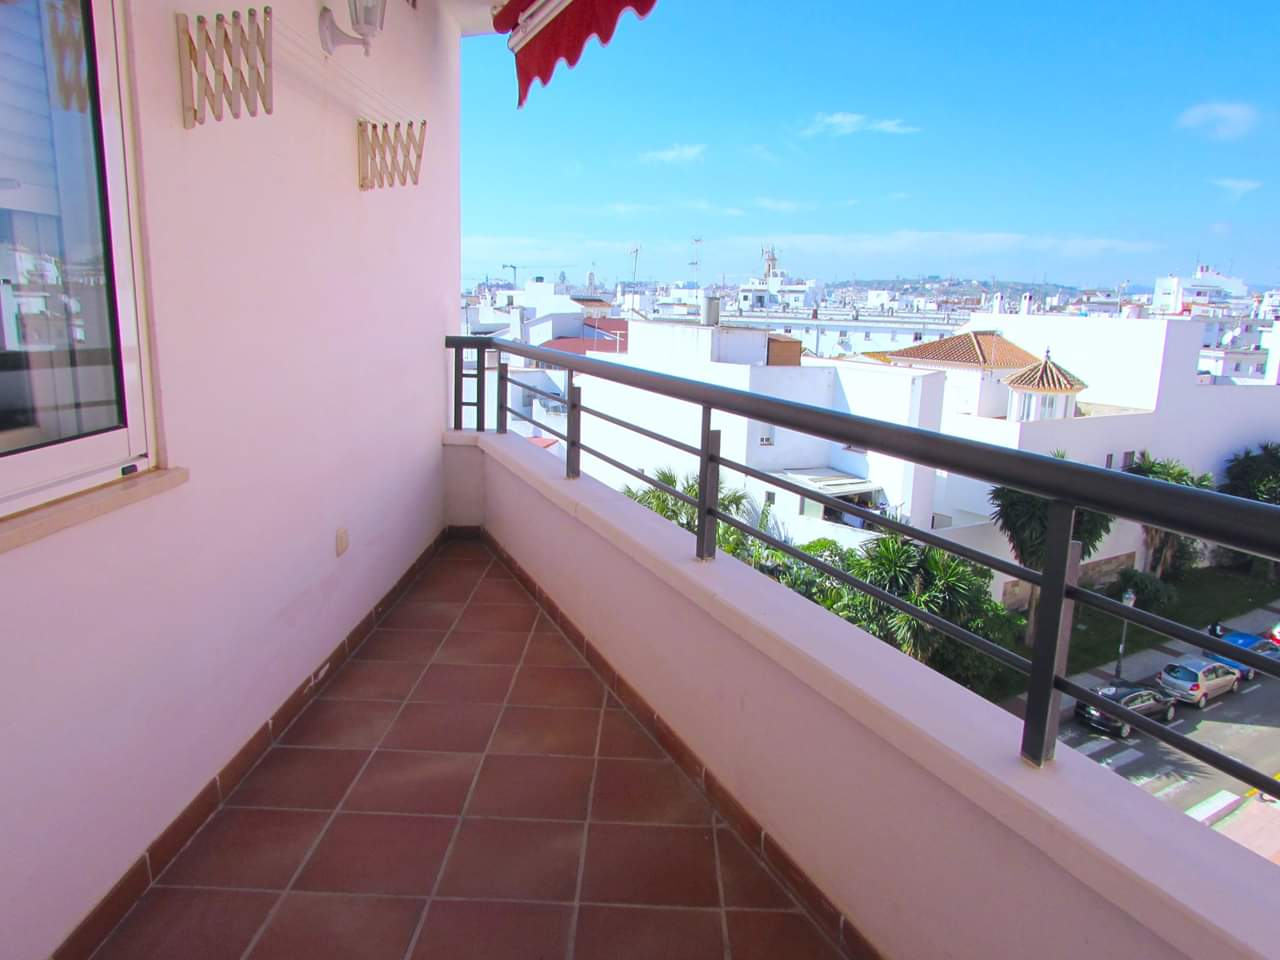 Venta Apartamento En Calle Manuel García Navarro – Estepona – Málaga – Andalucía